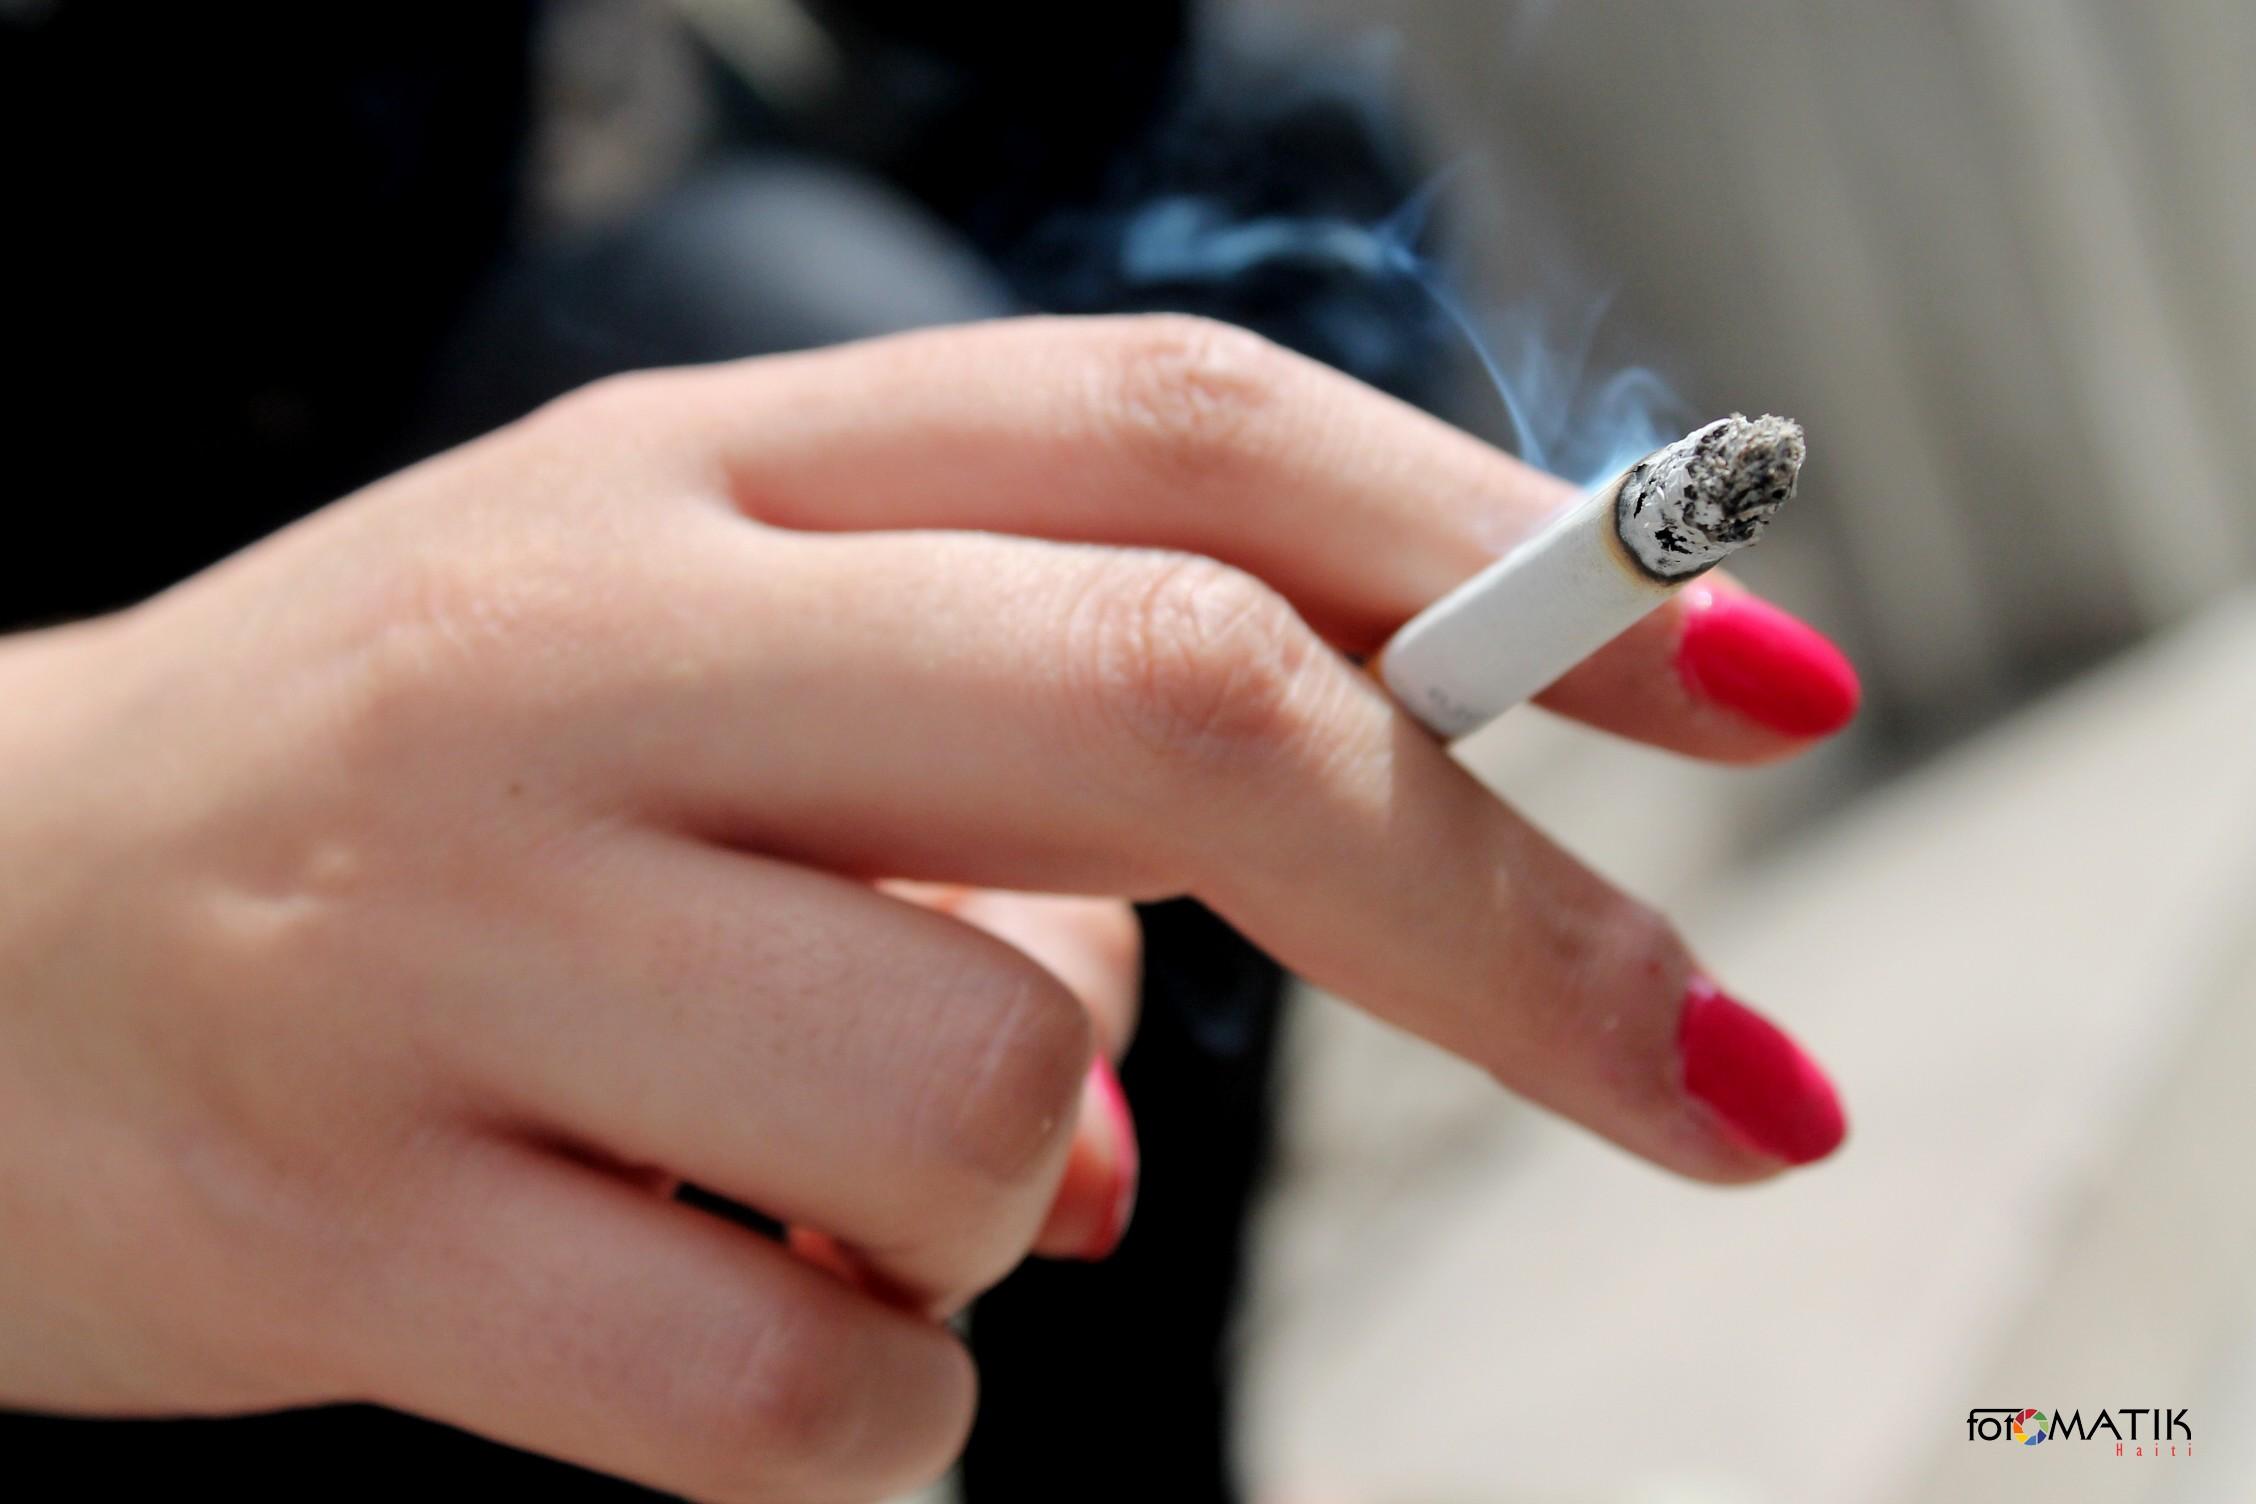 4 astuces pour se d barrasser de l odeur du tabac froid astuces de filles. Black Bedroom Furniture Sets. Home Design Ideas